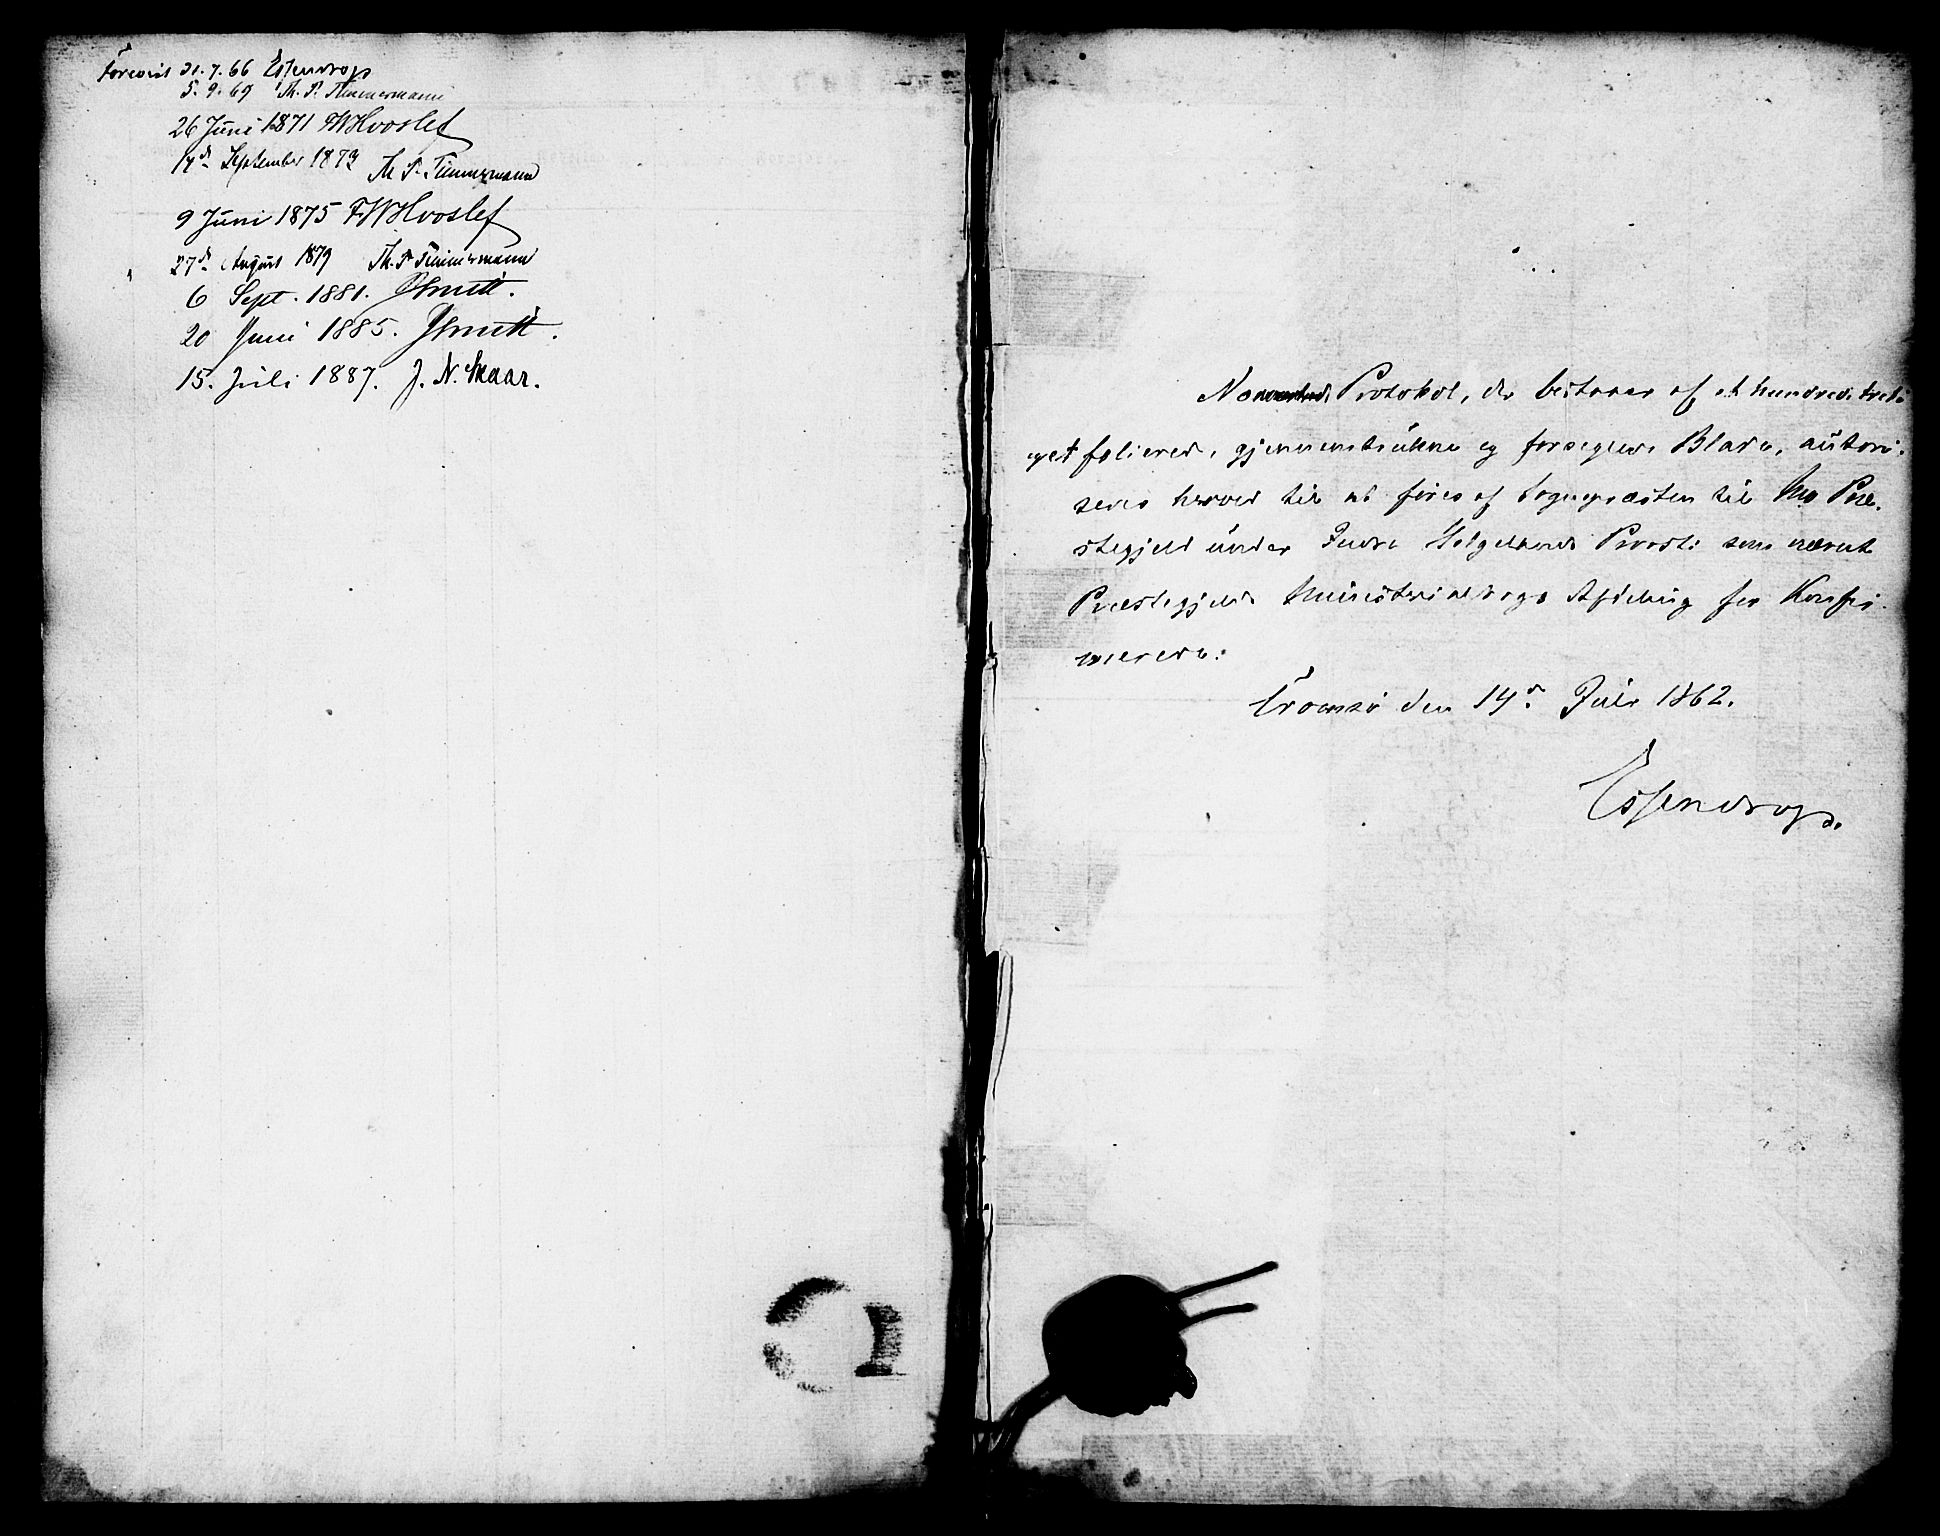 SAT, Ministerialprotokoller, klokkerbøker og fødselsregistre - Nordland, 827/L0394: Ministerialbok nr. 827A06, 1865-1886